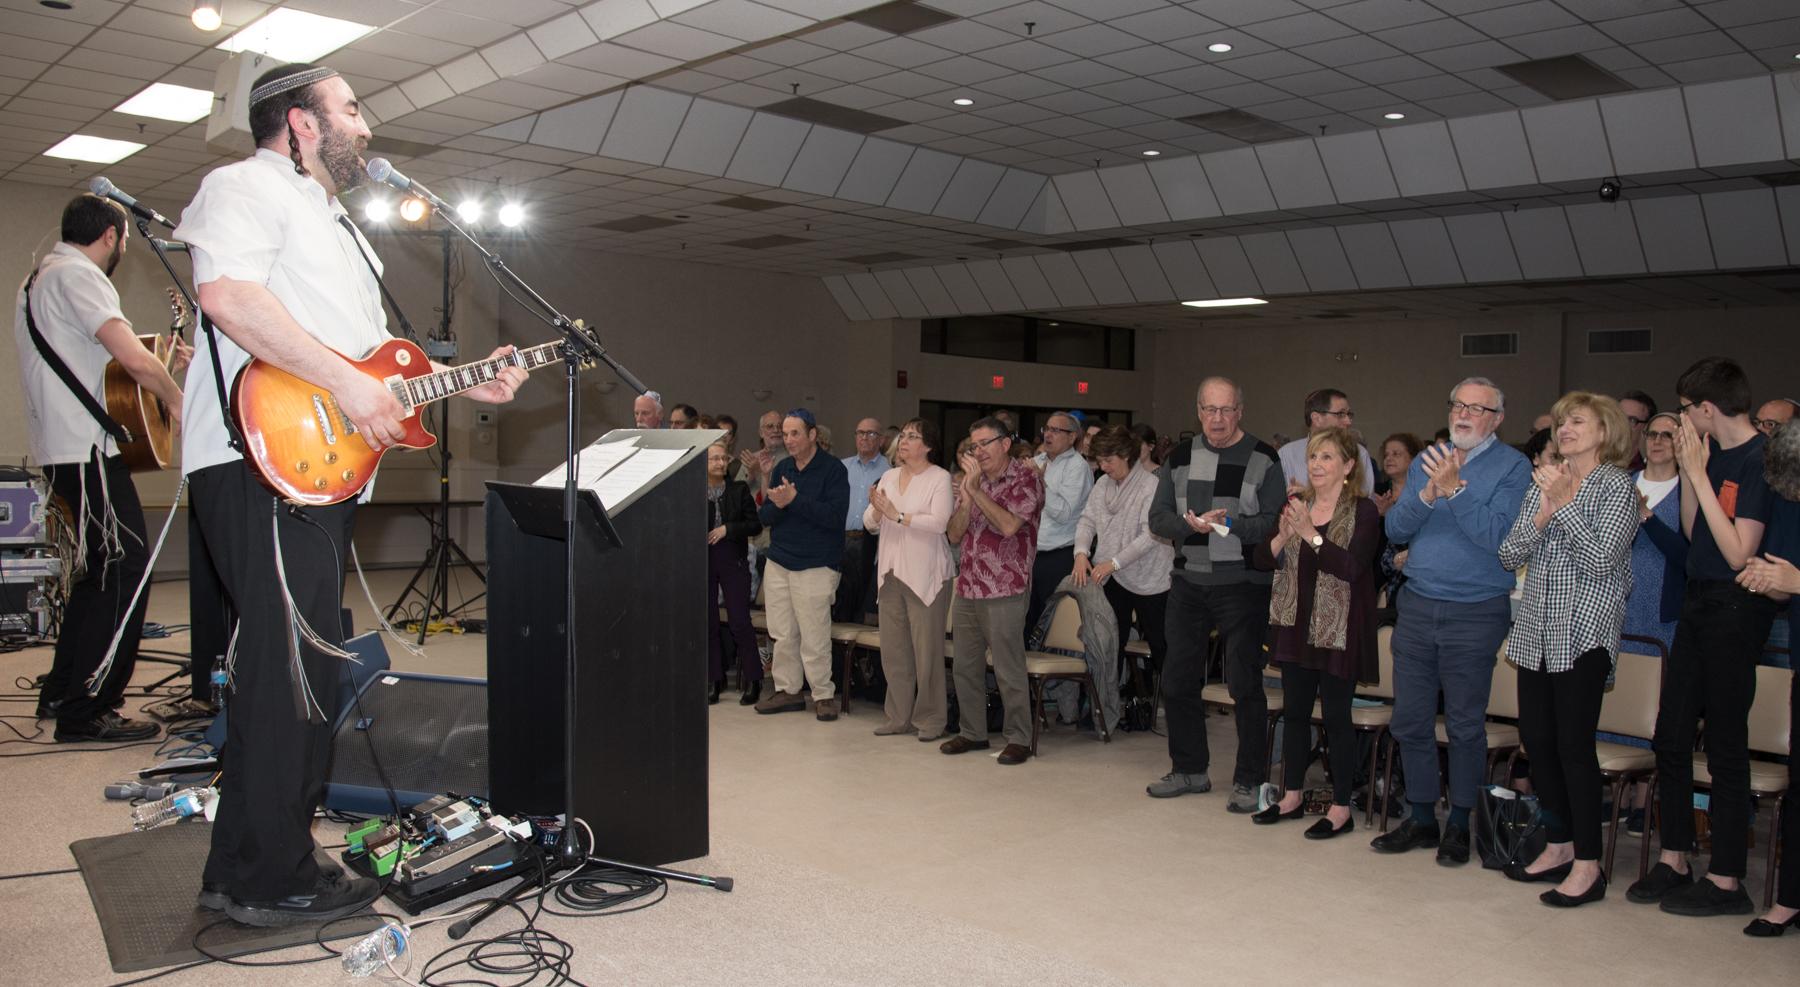 Tikvat-Israel-Pey-Dalid-Concert-040719-5591